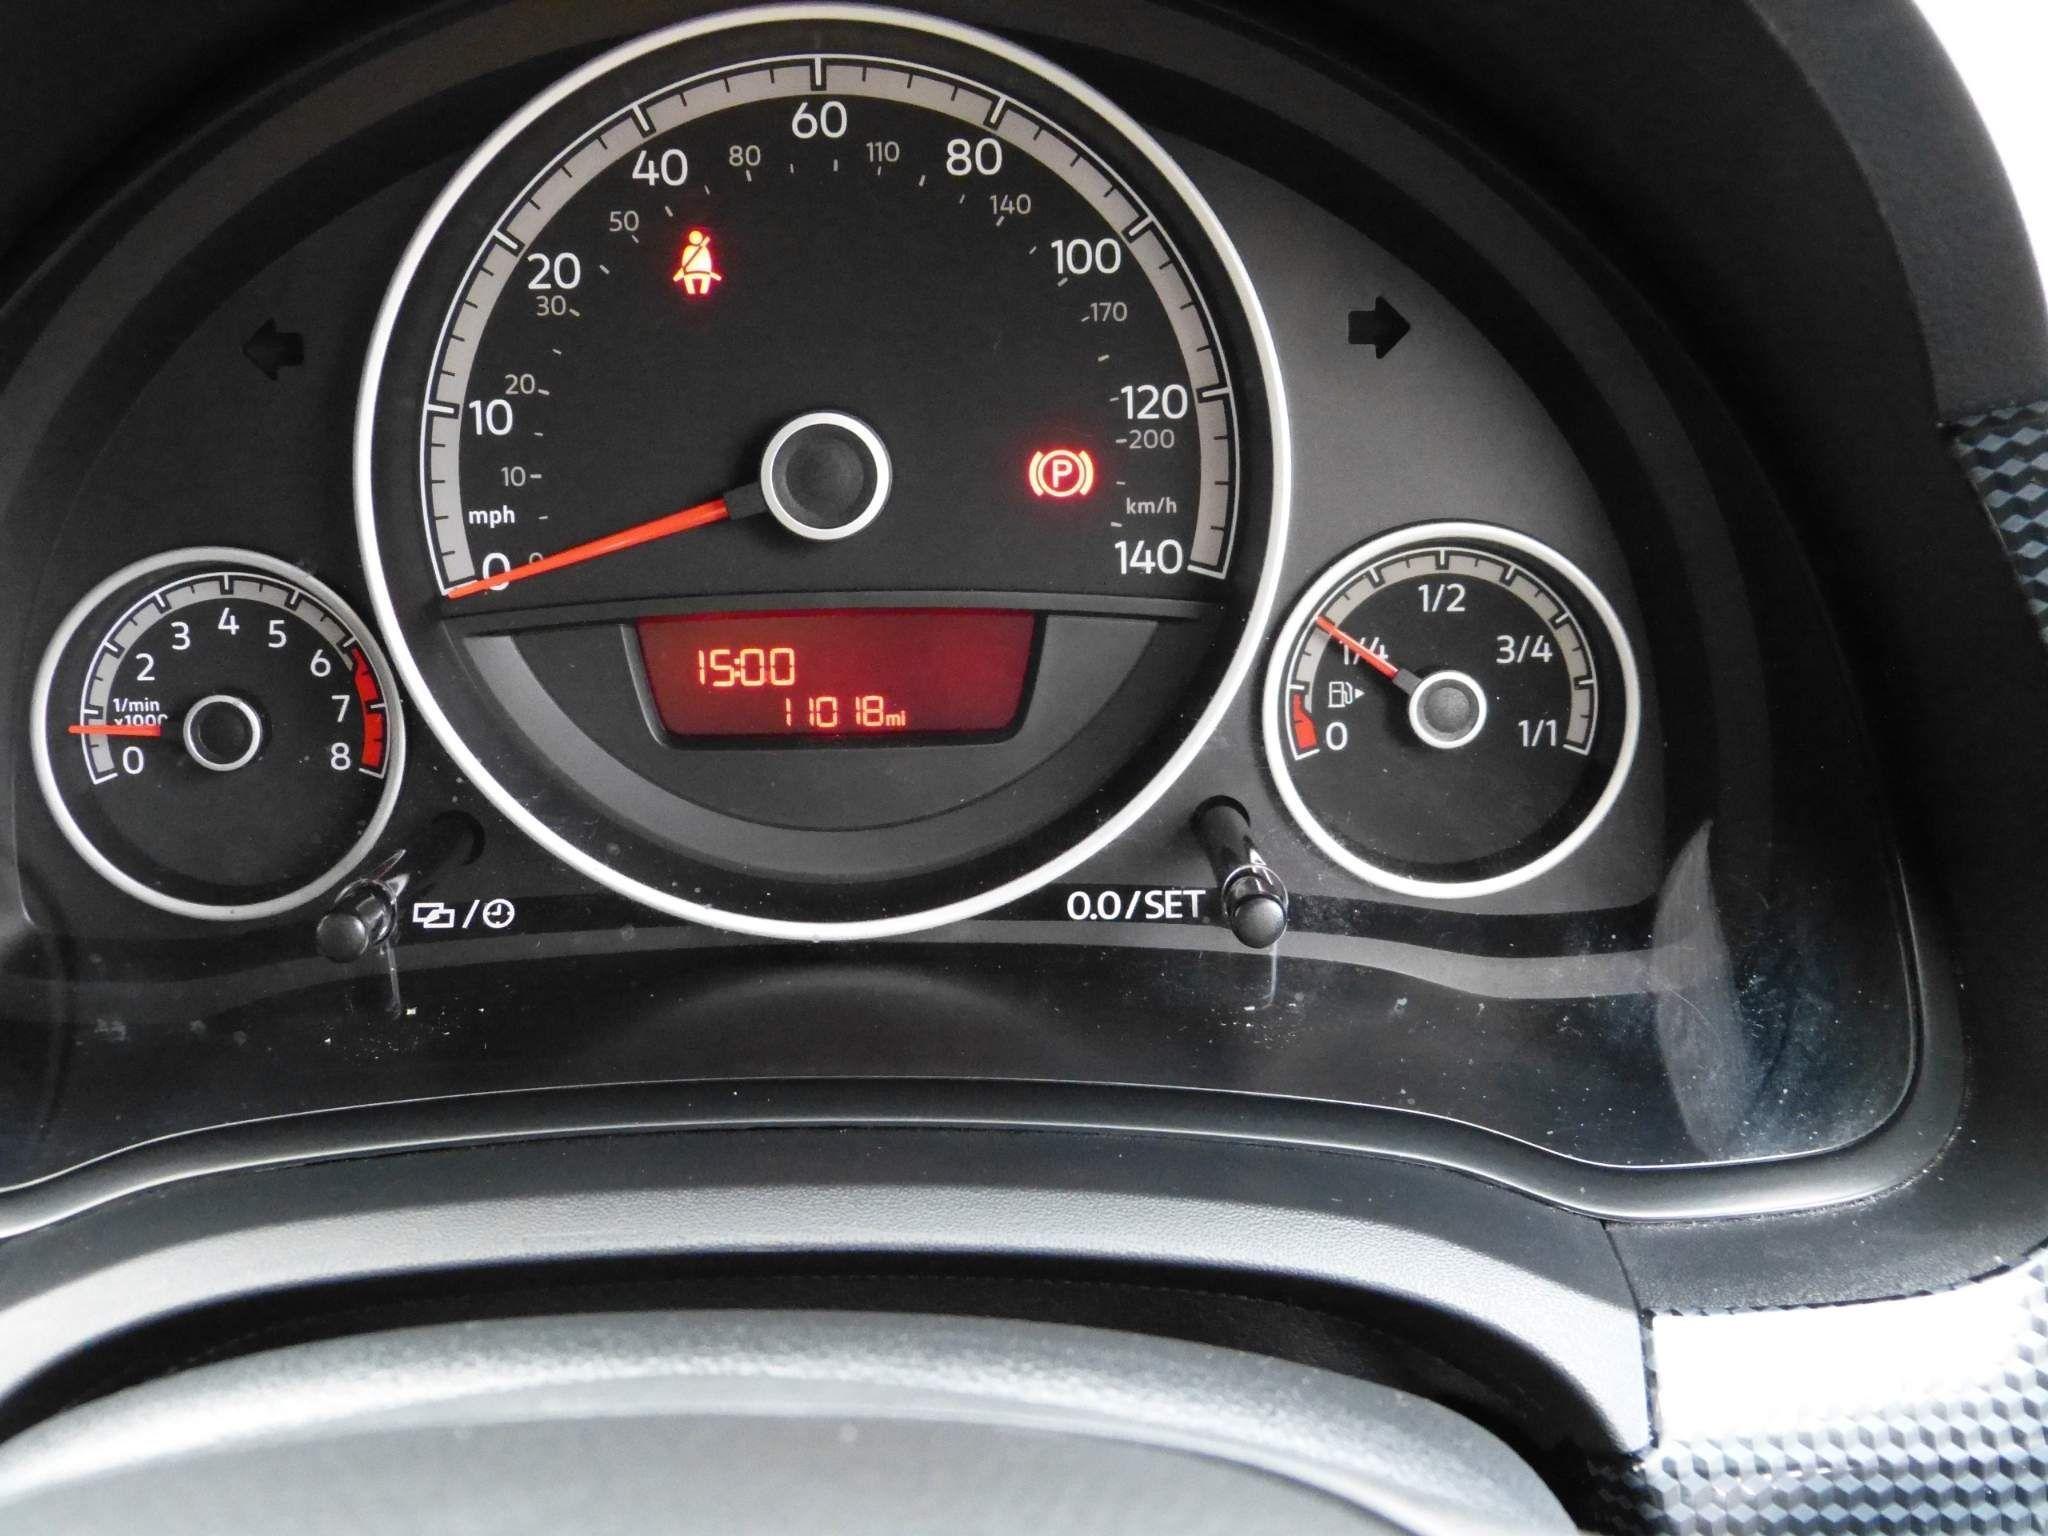 2018 VOLKSWAGEN up! 1.0 Move  (s/s) Petrol Manual only 11000 miles – Beechlawn Motors Belfast full